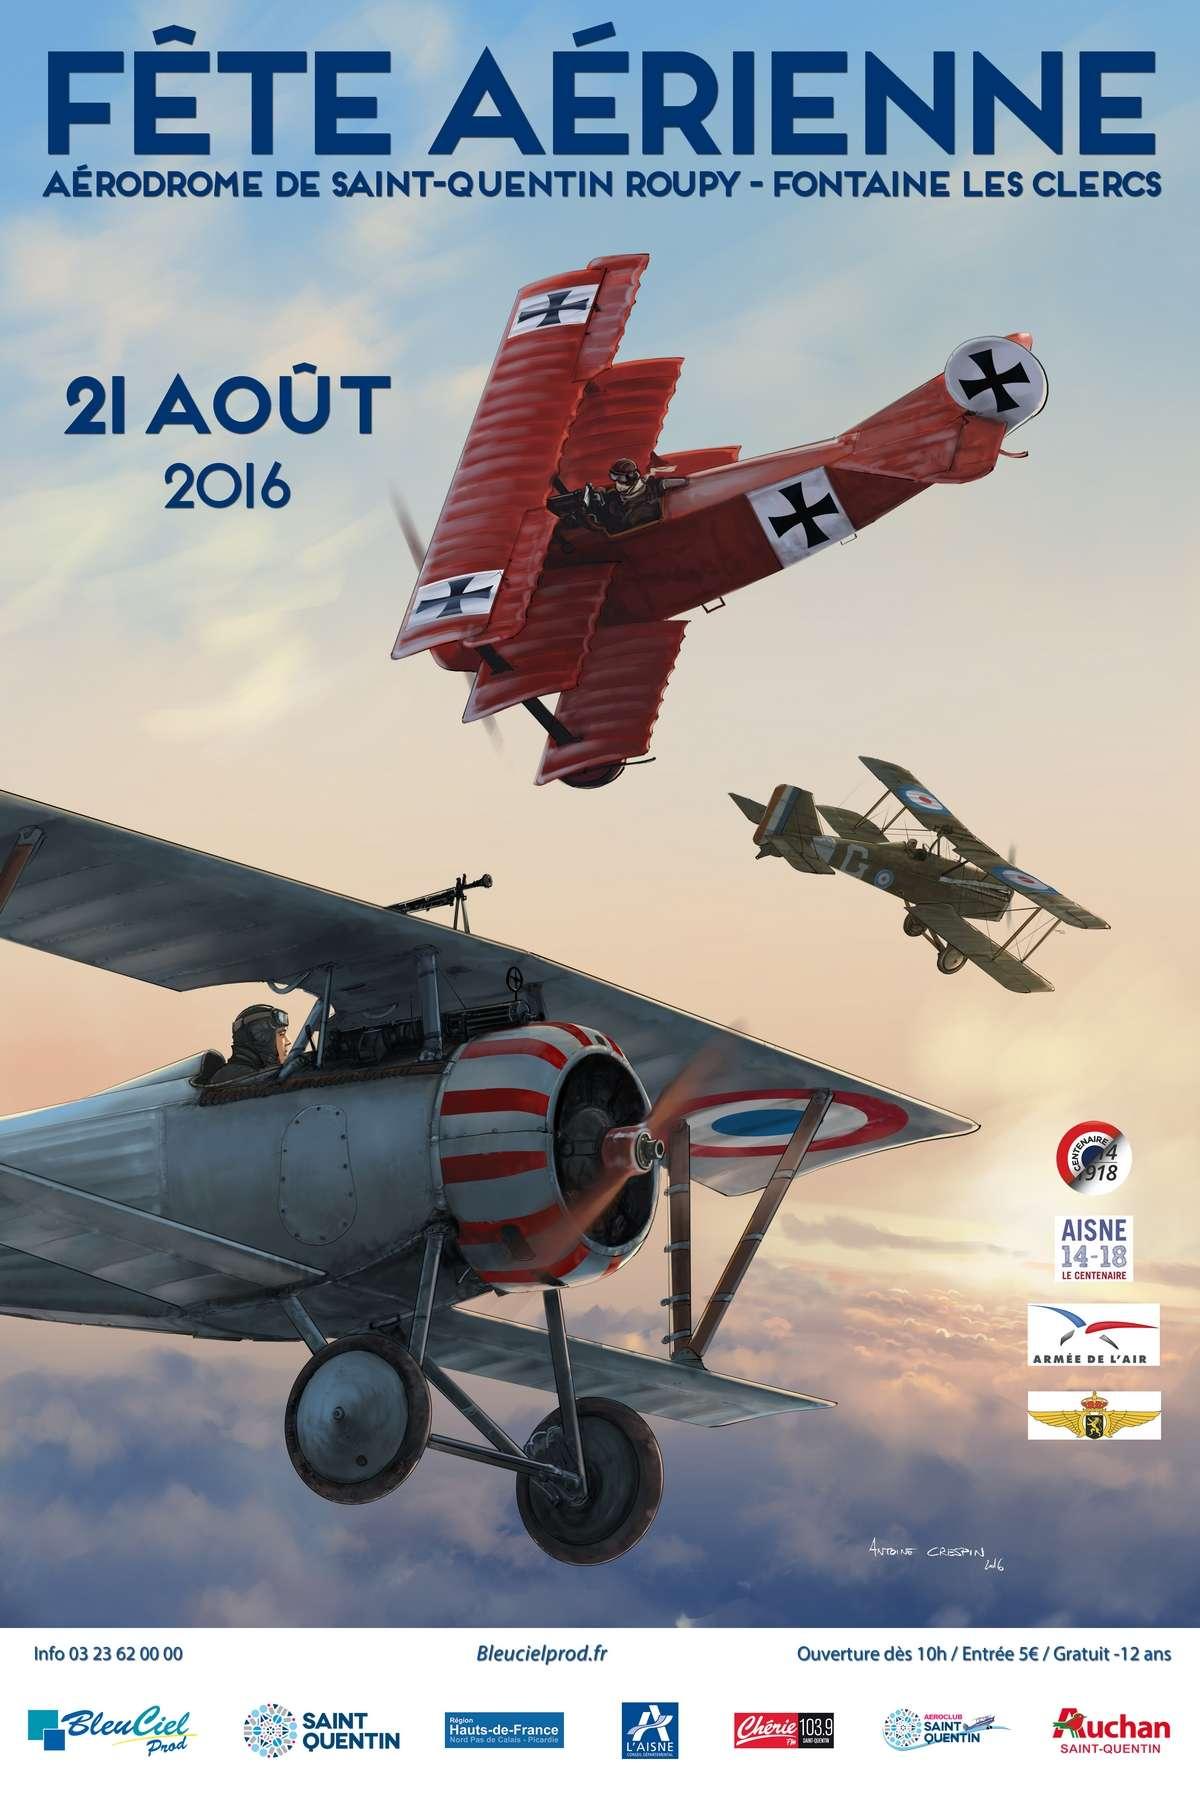 Fête Aérienne ST-Quentin/Roupy 2016, Meeting Aerien 2016, Airshow 2016, French Airshow 2016